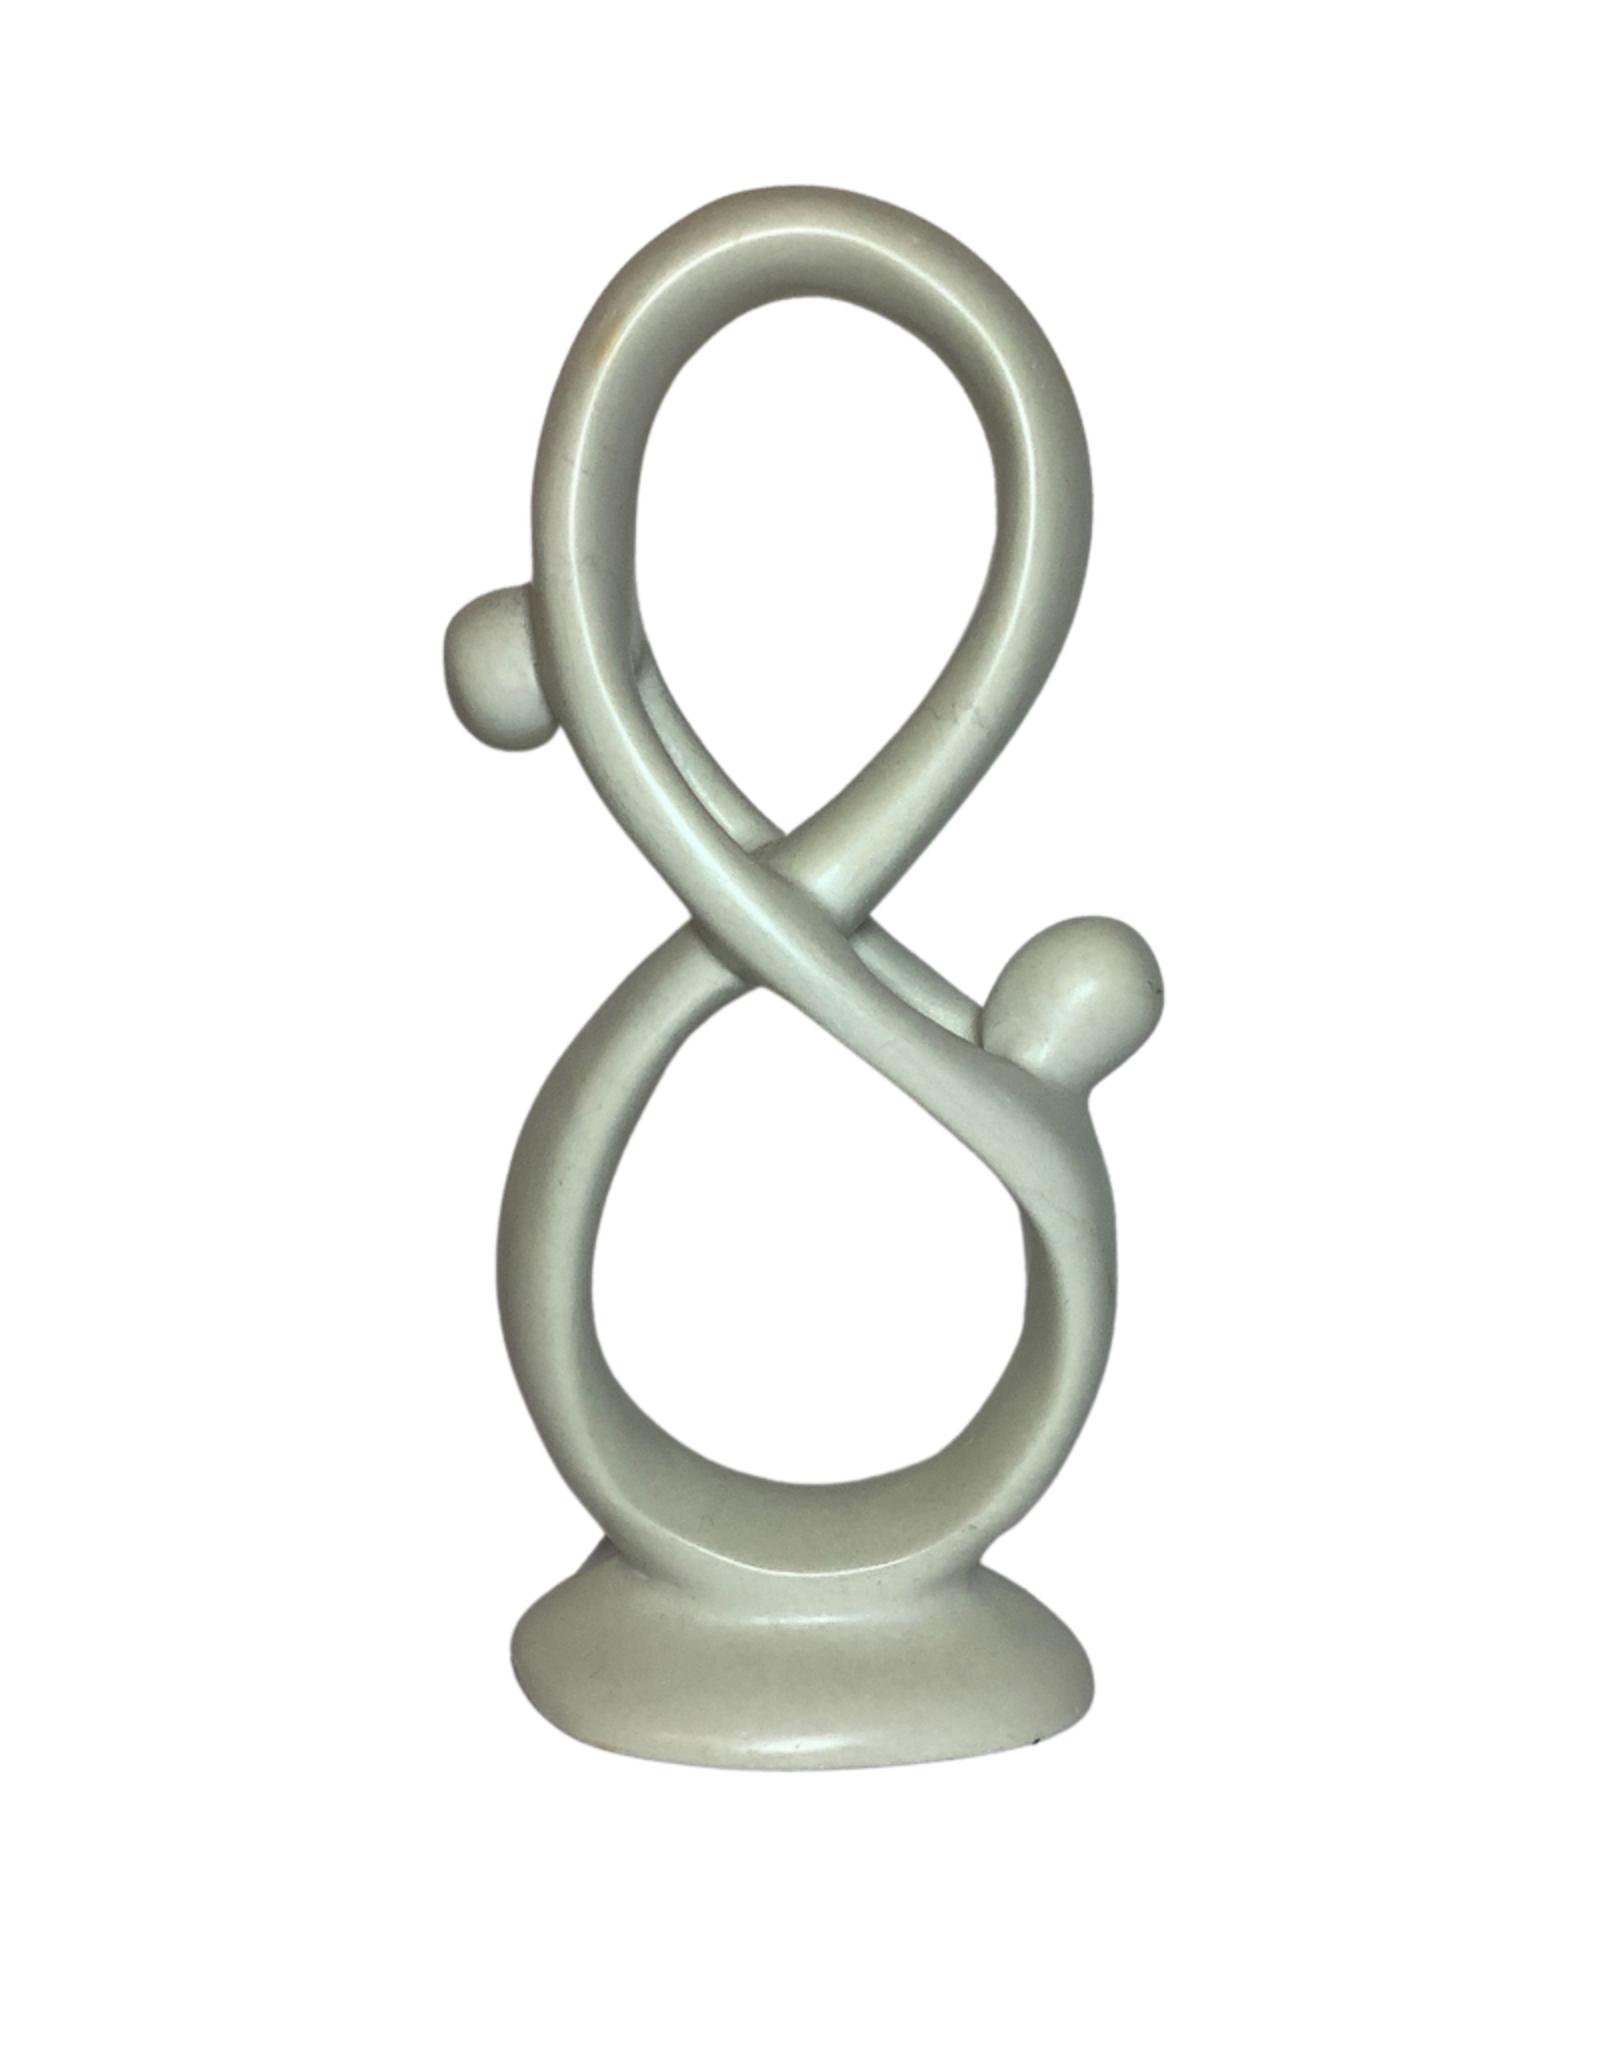 To Infinity Kisii Stone Sculpture